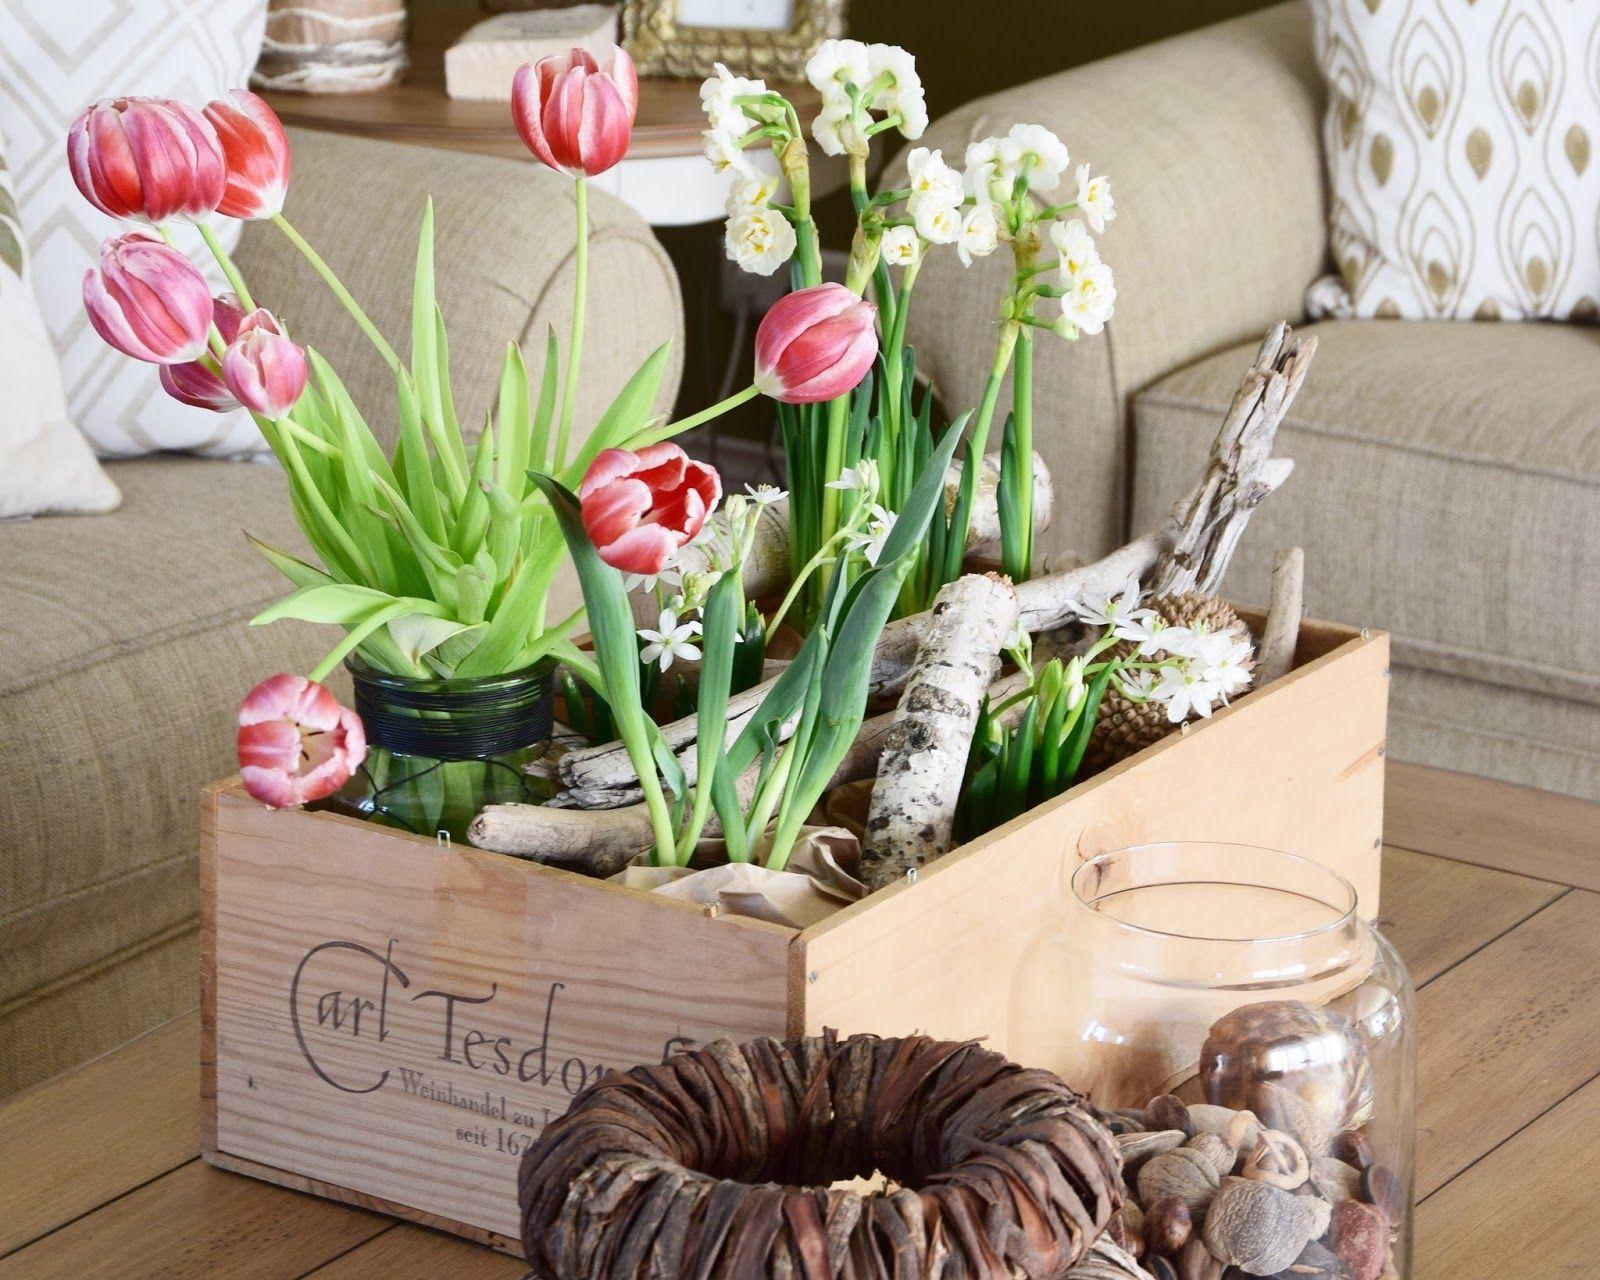 Holt euch den Frühling mit einer Kiste voller Frühjahrsblüher ins ...